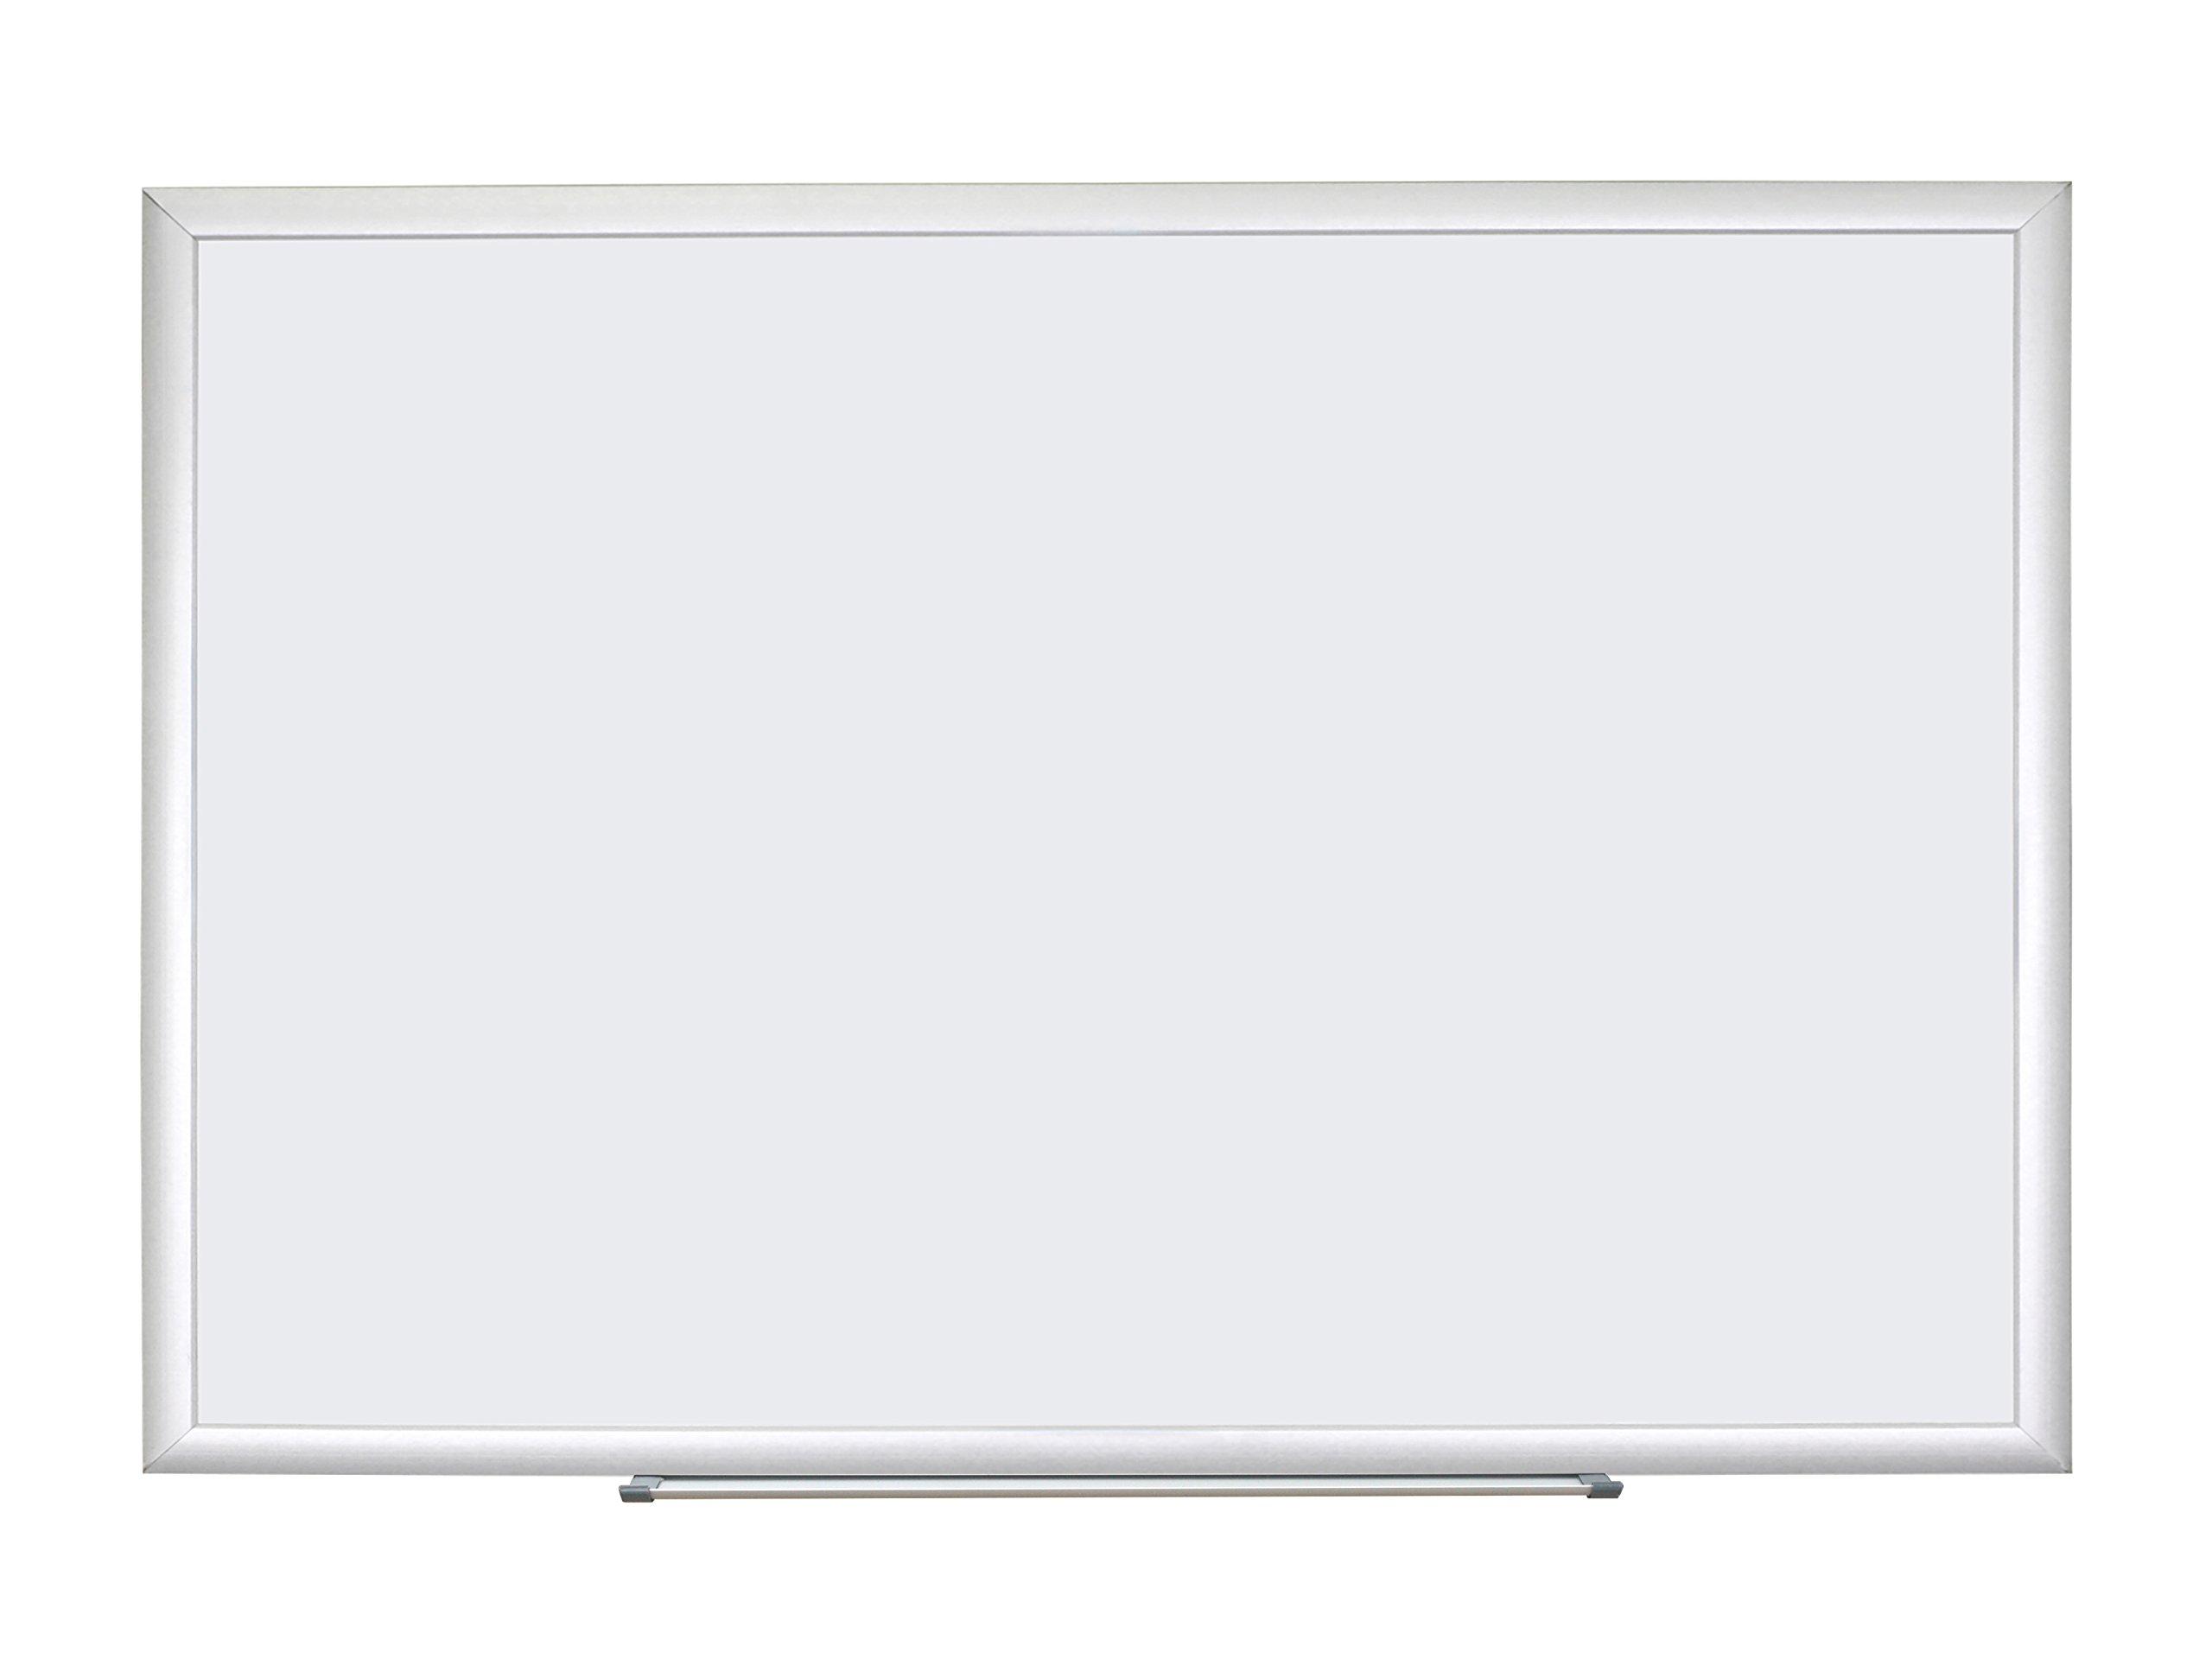 U Brands Basics Dry Erase Board, 70 x 47 Inches, Melamine Surface, Silver Aluminum Frame